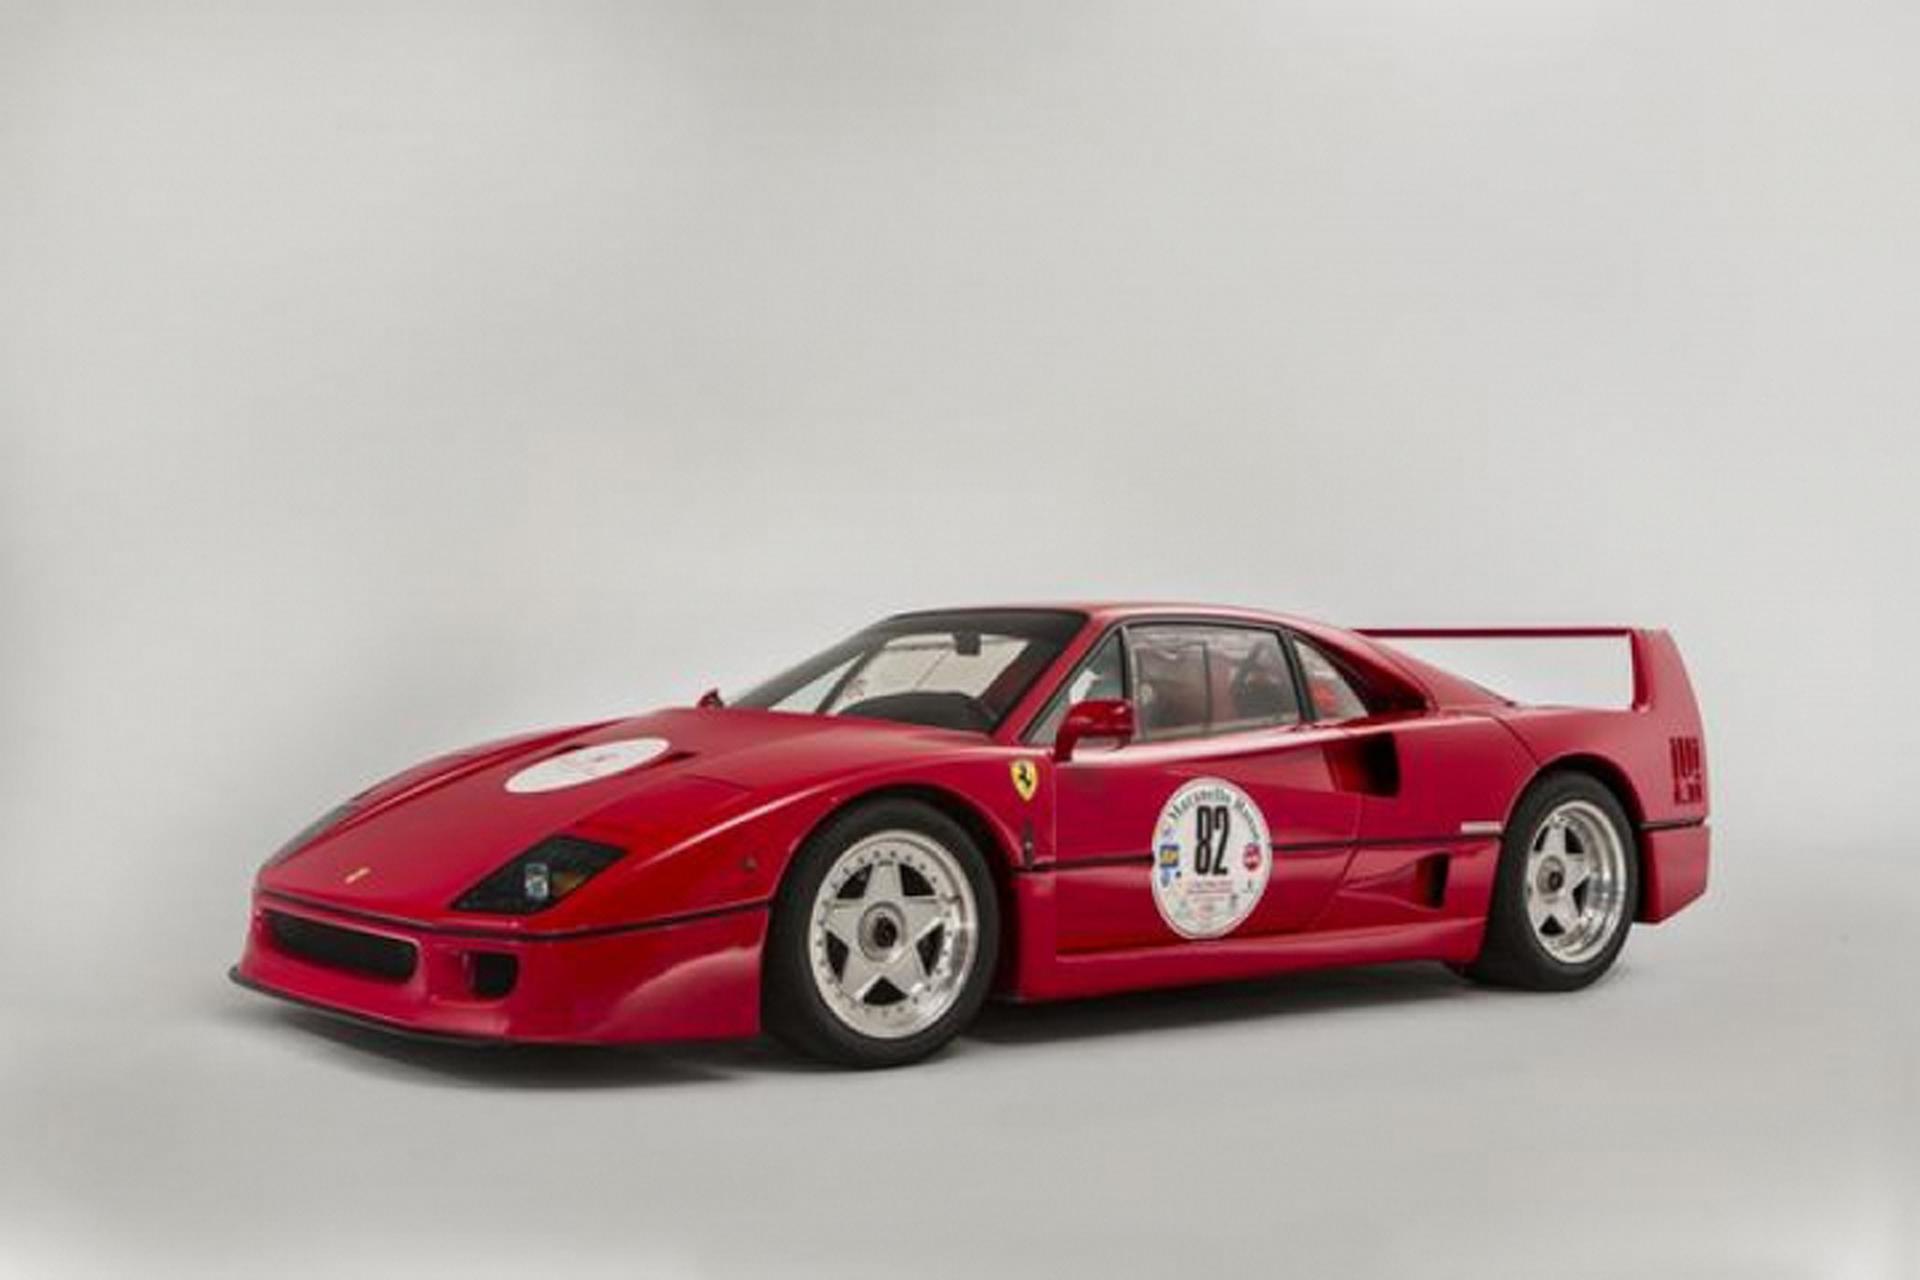 1991 Ferrari F40 Brings Over $1 Million at Goodwood Revival Auction